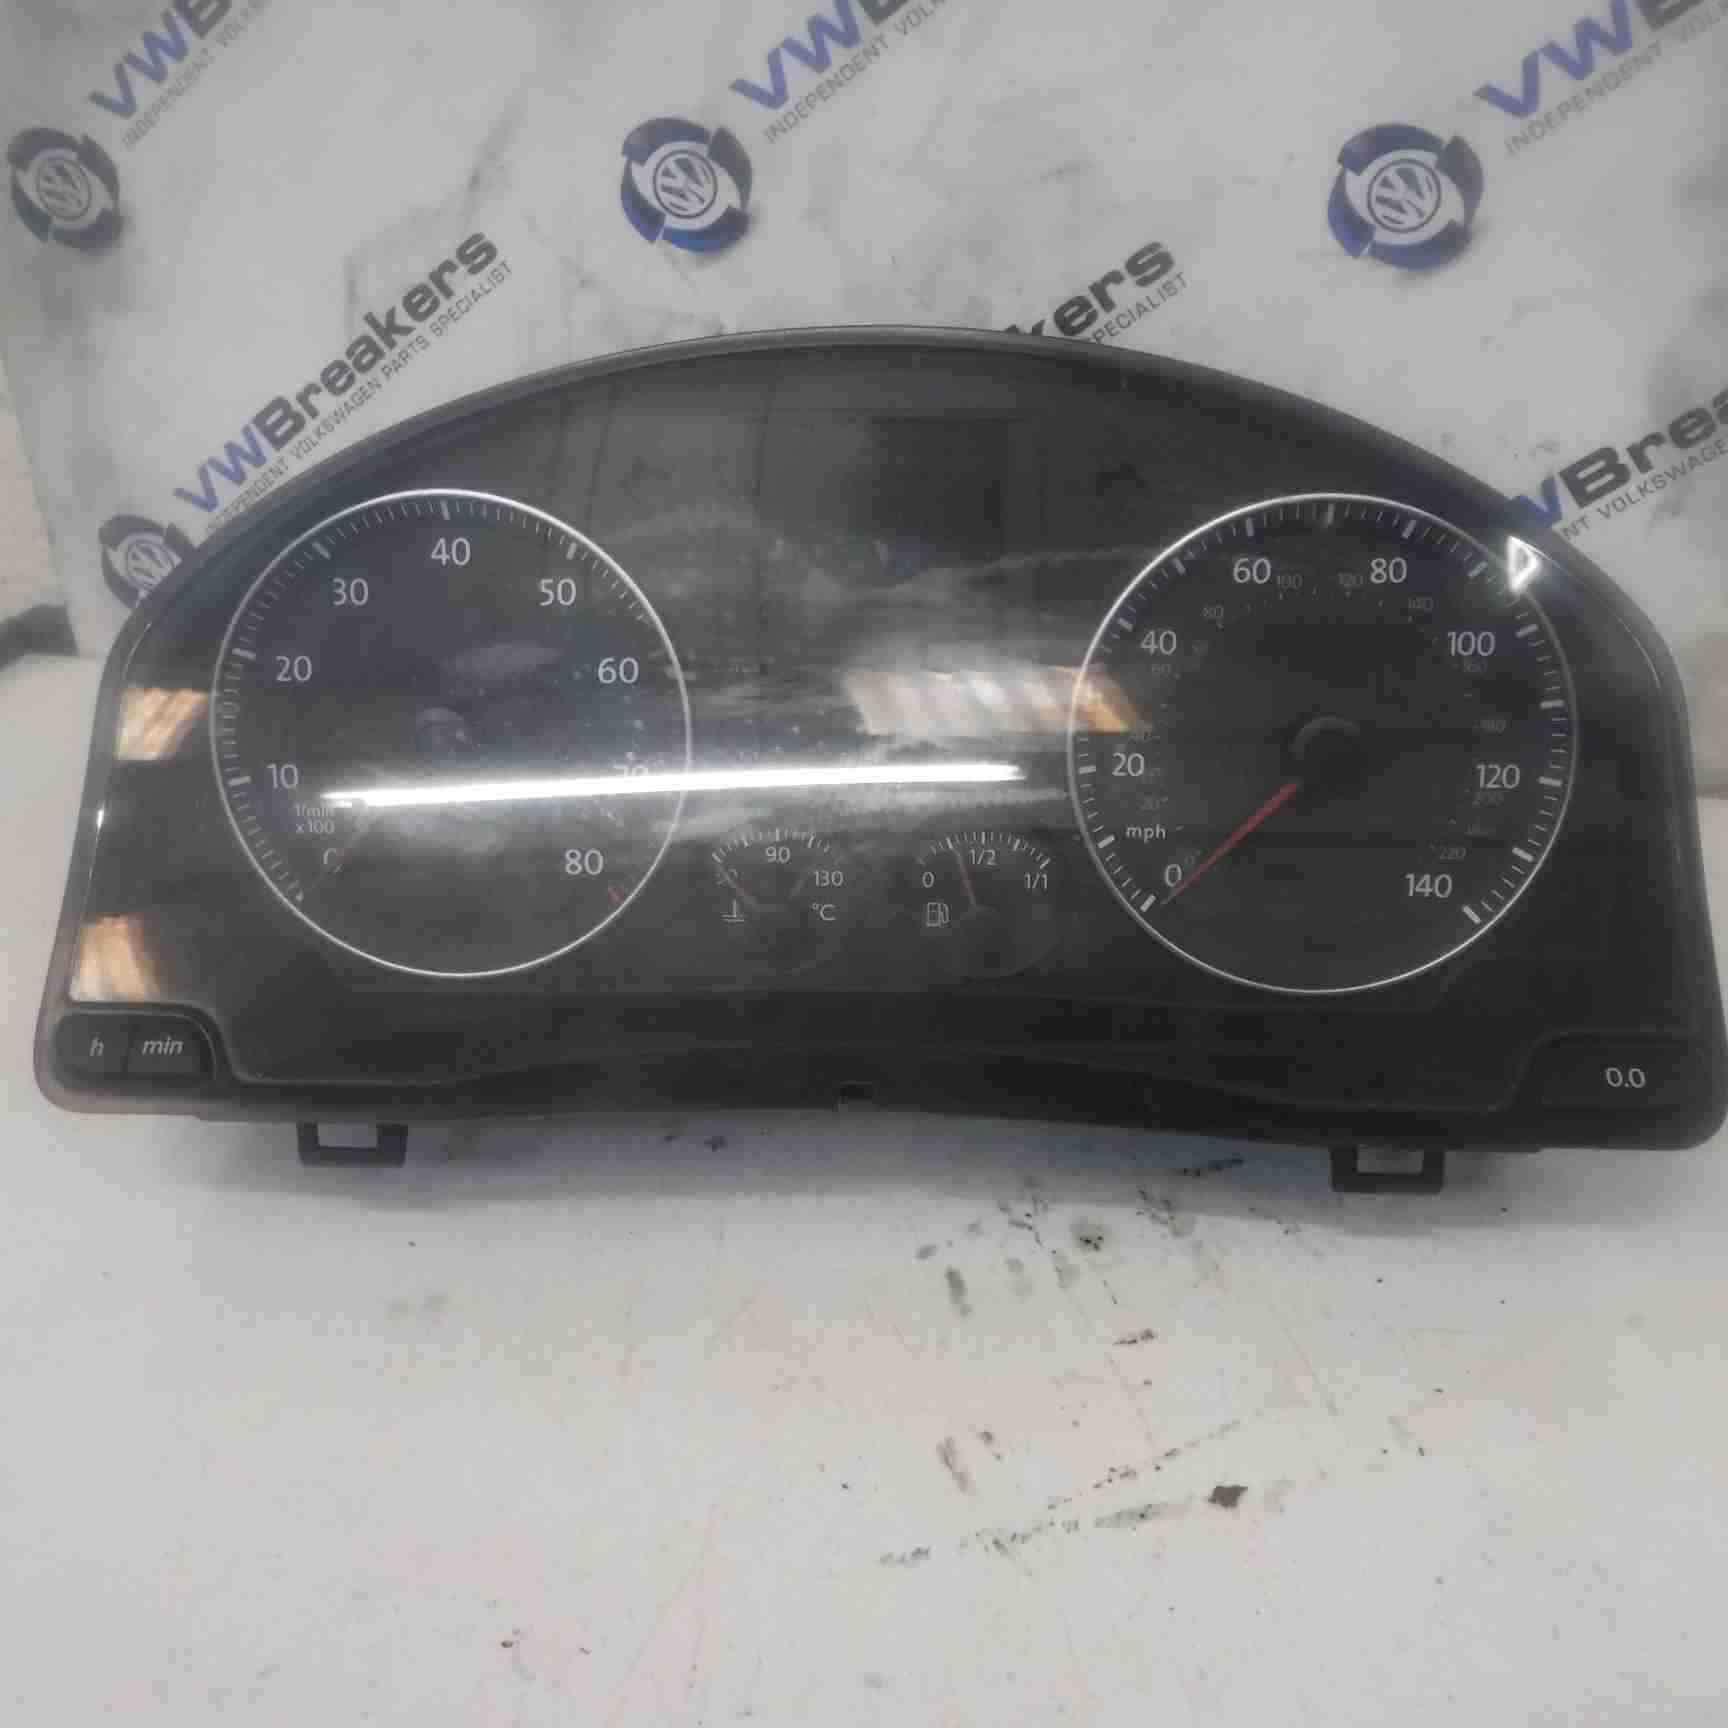 Volkswagen Golf MK5 2003-2009 Instrument Panel Dials Gauges Clocks Cluster 143k